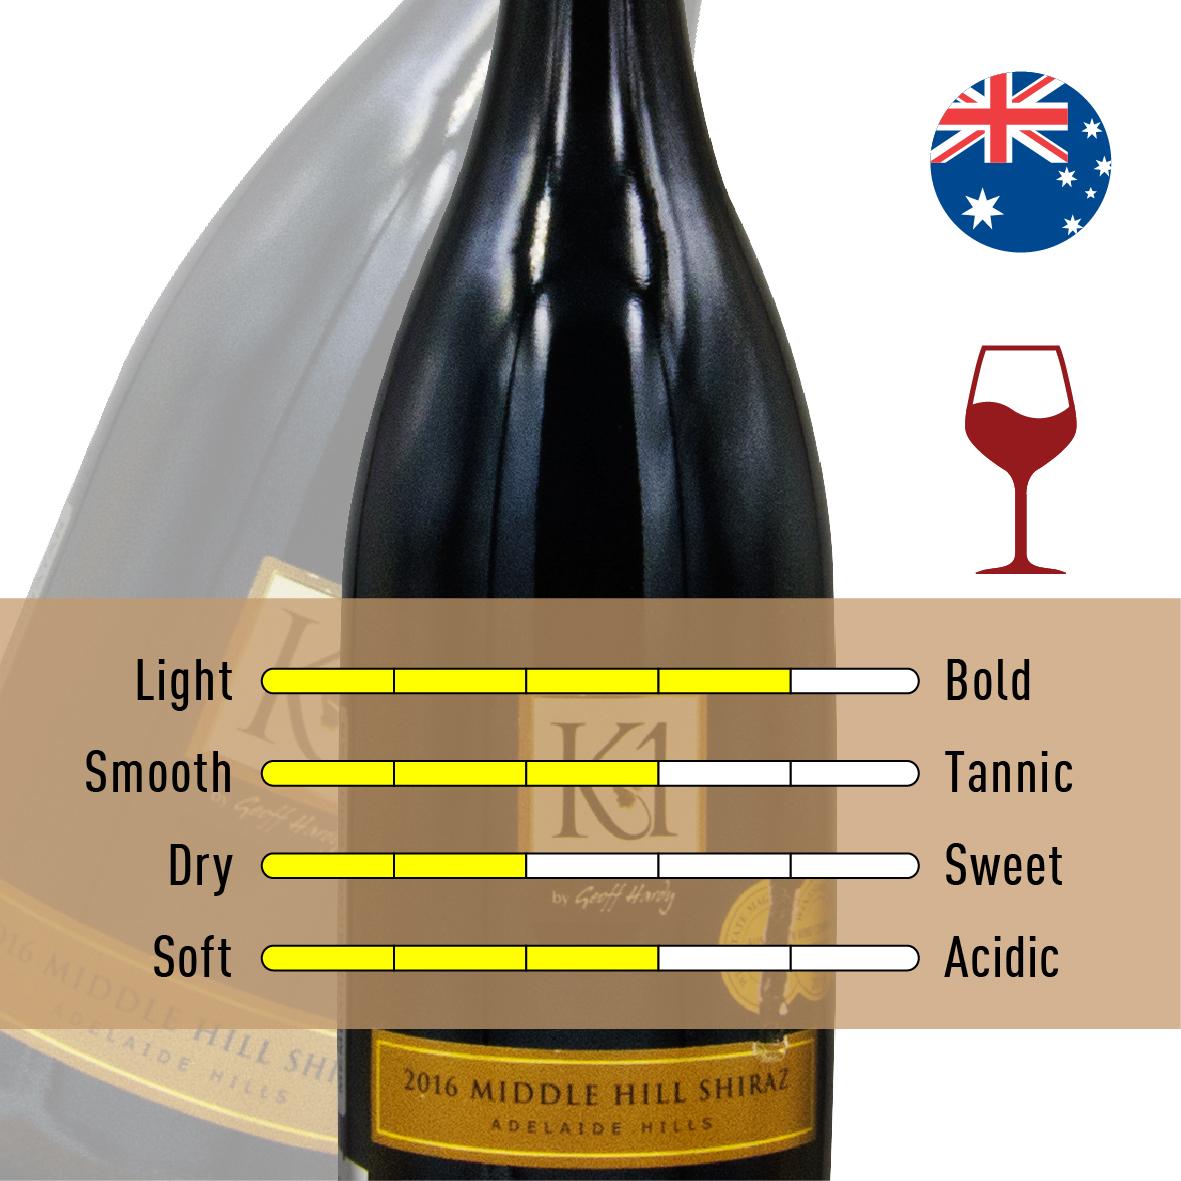 11-GEOFF HARDY K1 MIDDLE HILL SHIRAZ 2016-Australia-02.jpg